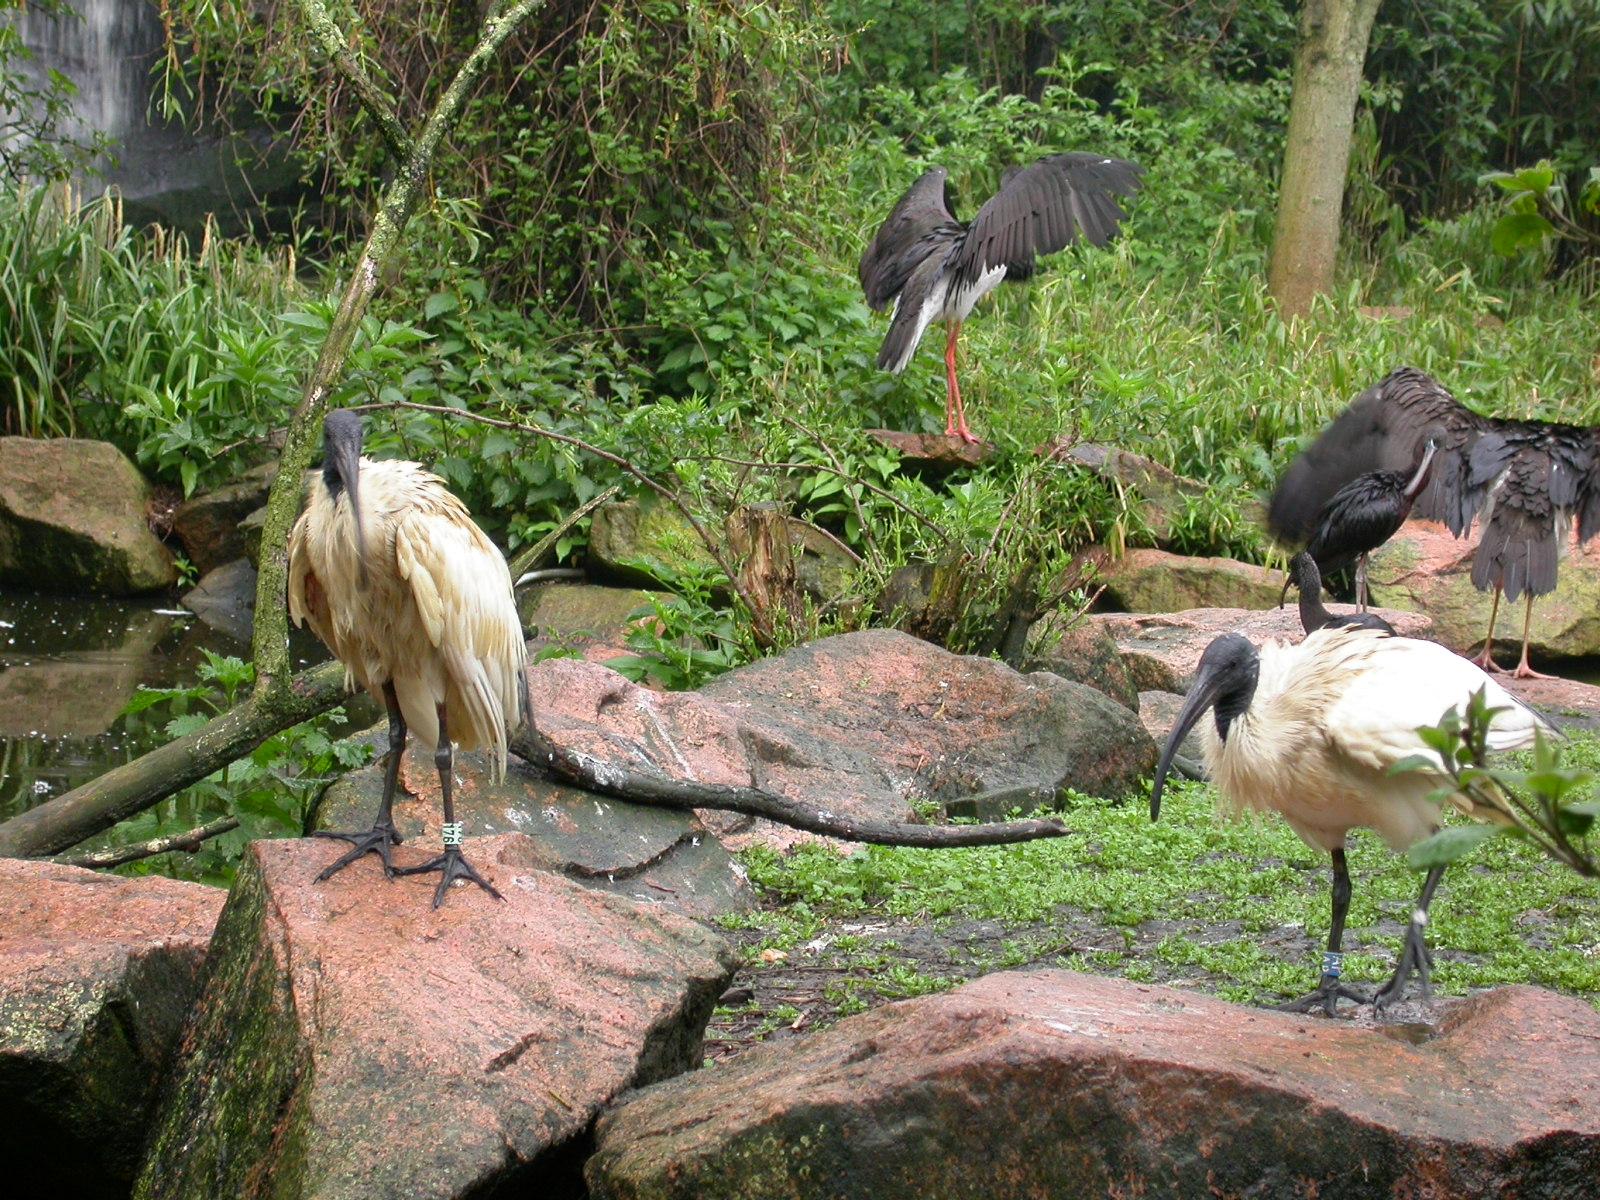 eva pelicans birds wading zoo black feathers long beaks